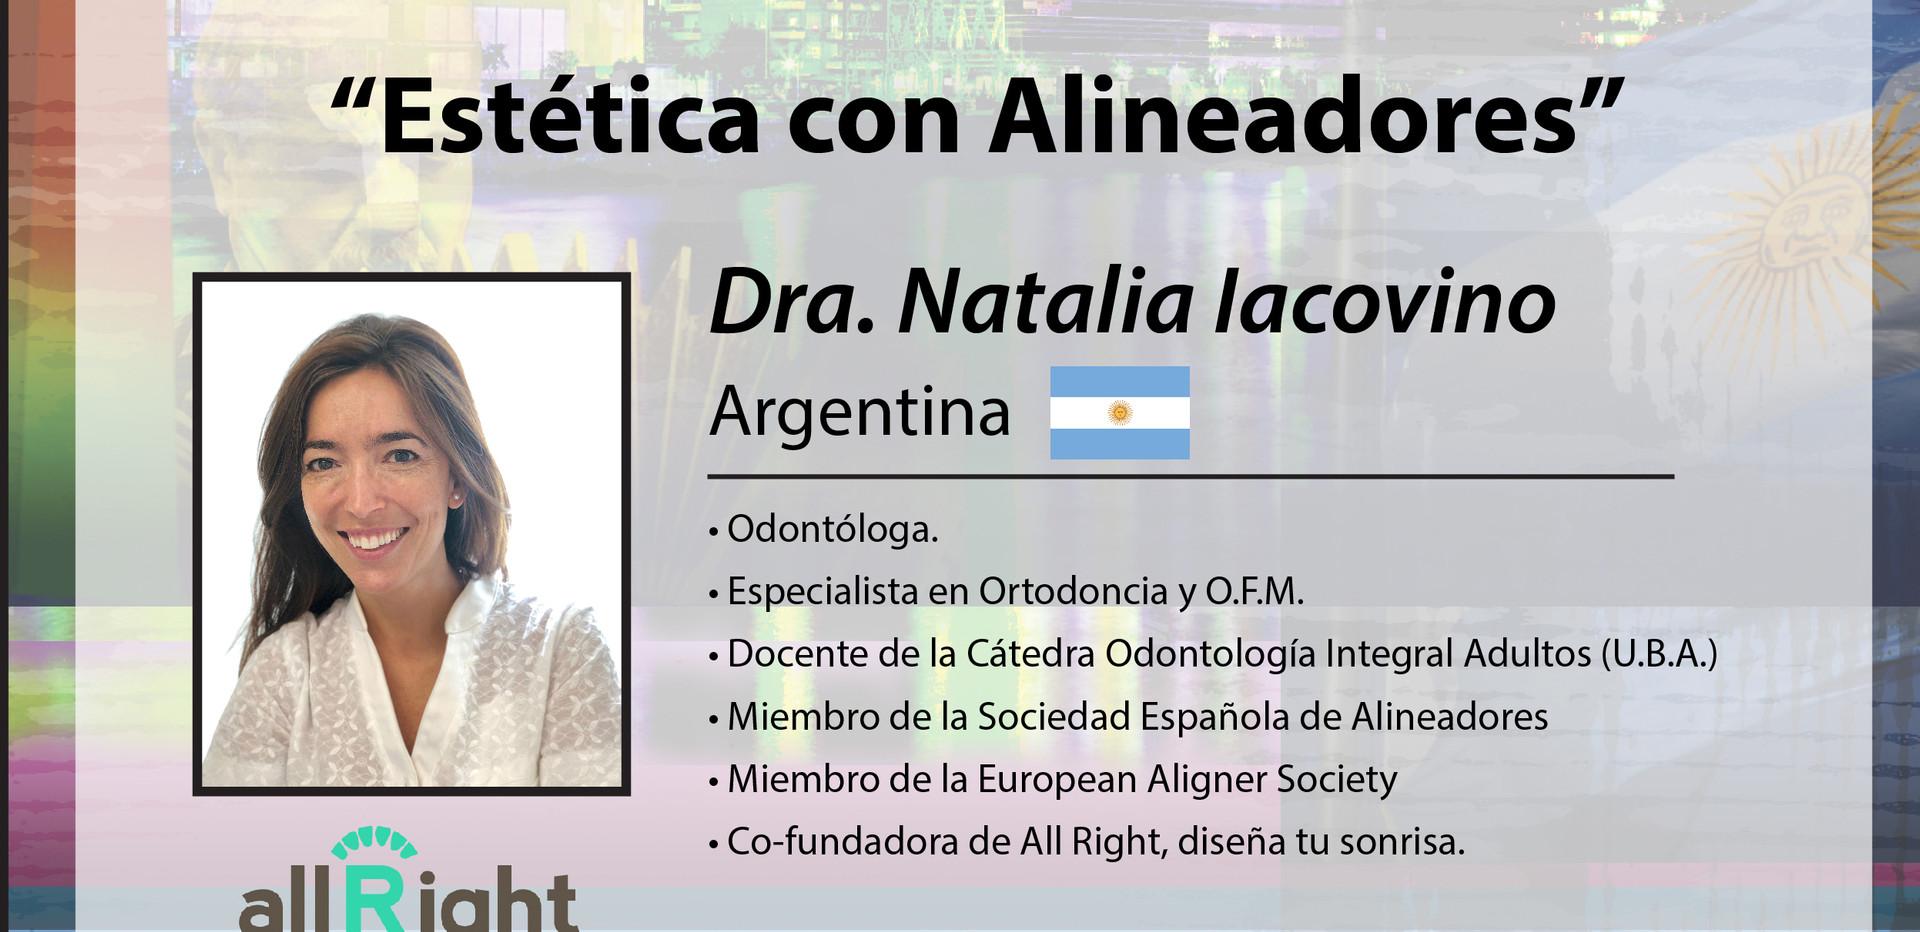 Dra. Natalia Iacovino